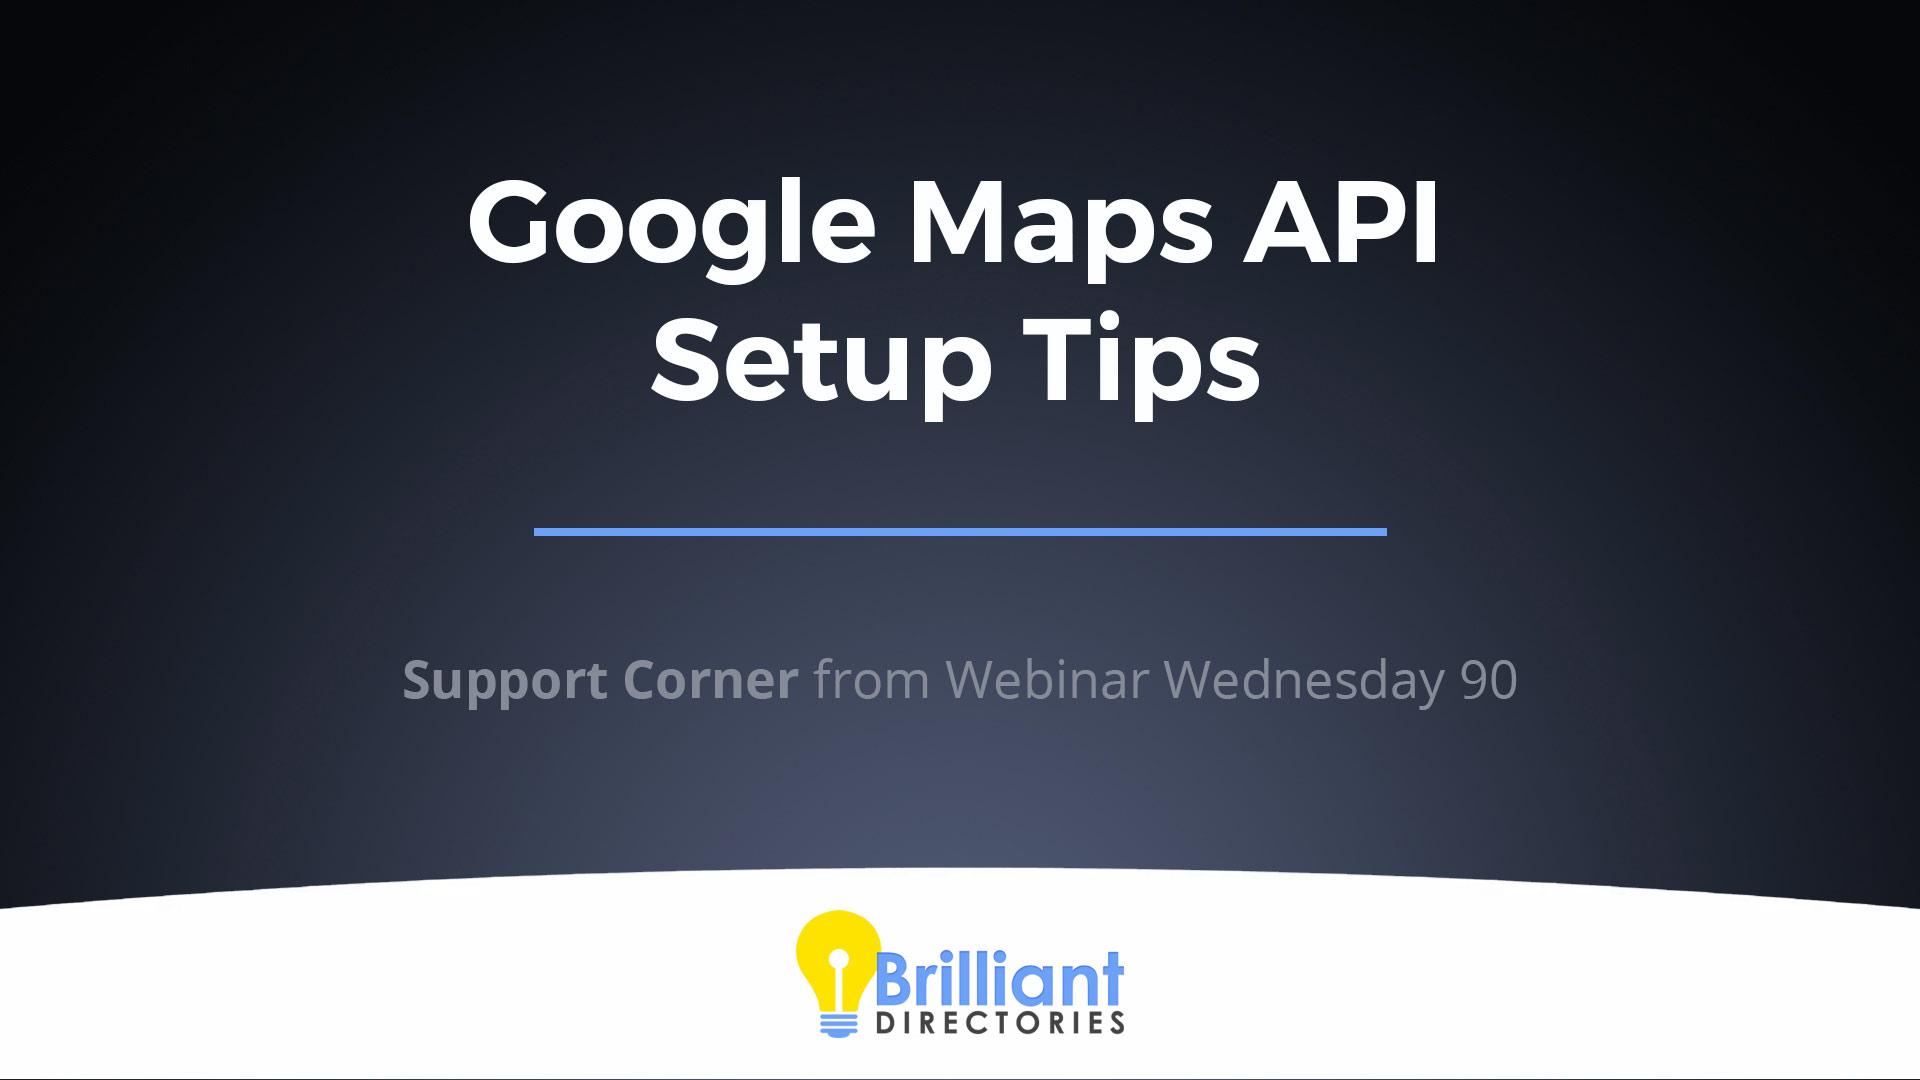 https://www.brilliantdirectories.com/blog/google-maps-api-setup-troubleshooting